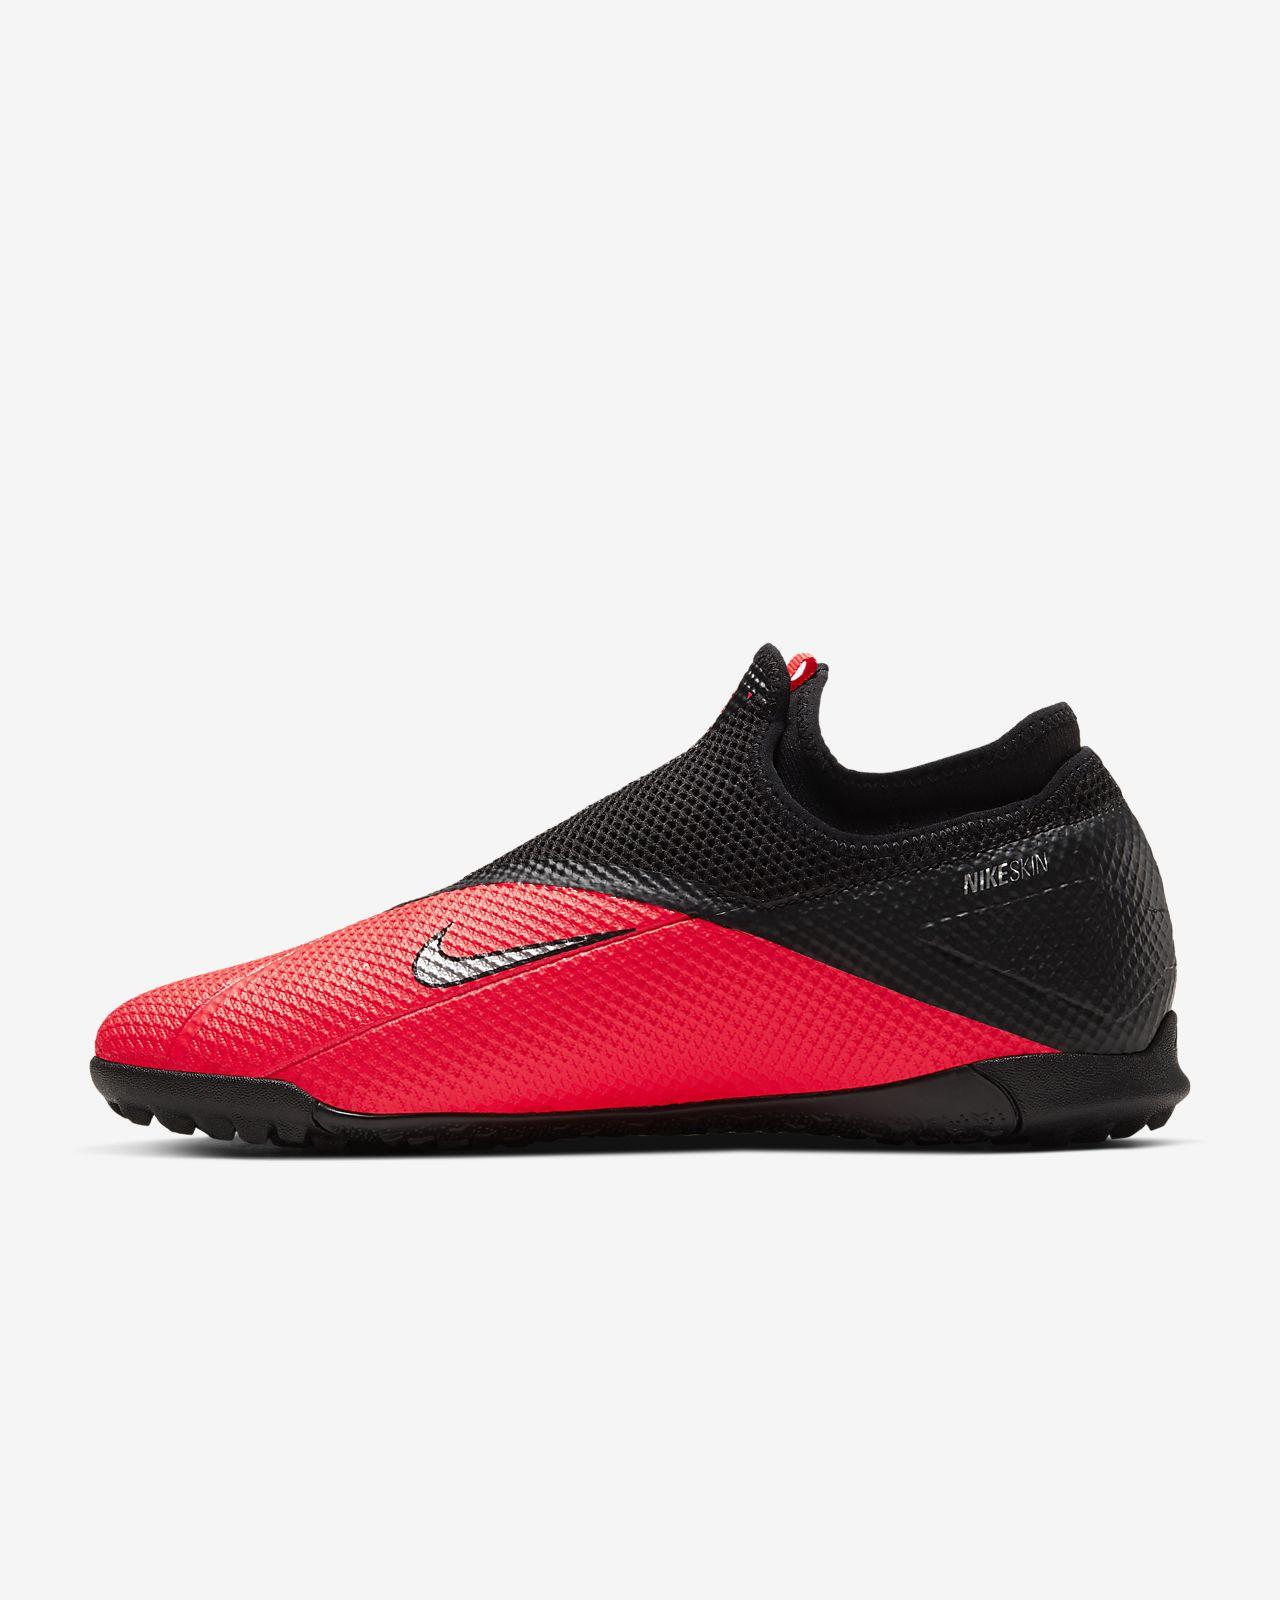 Nike Phantom VSN 2 Academy DF TF 暗煞系列男/女人造场地足球鞋